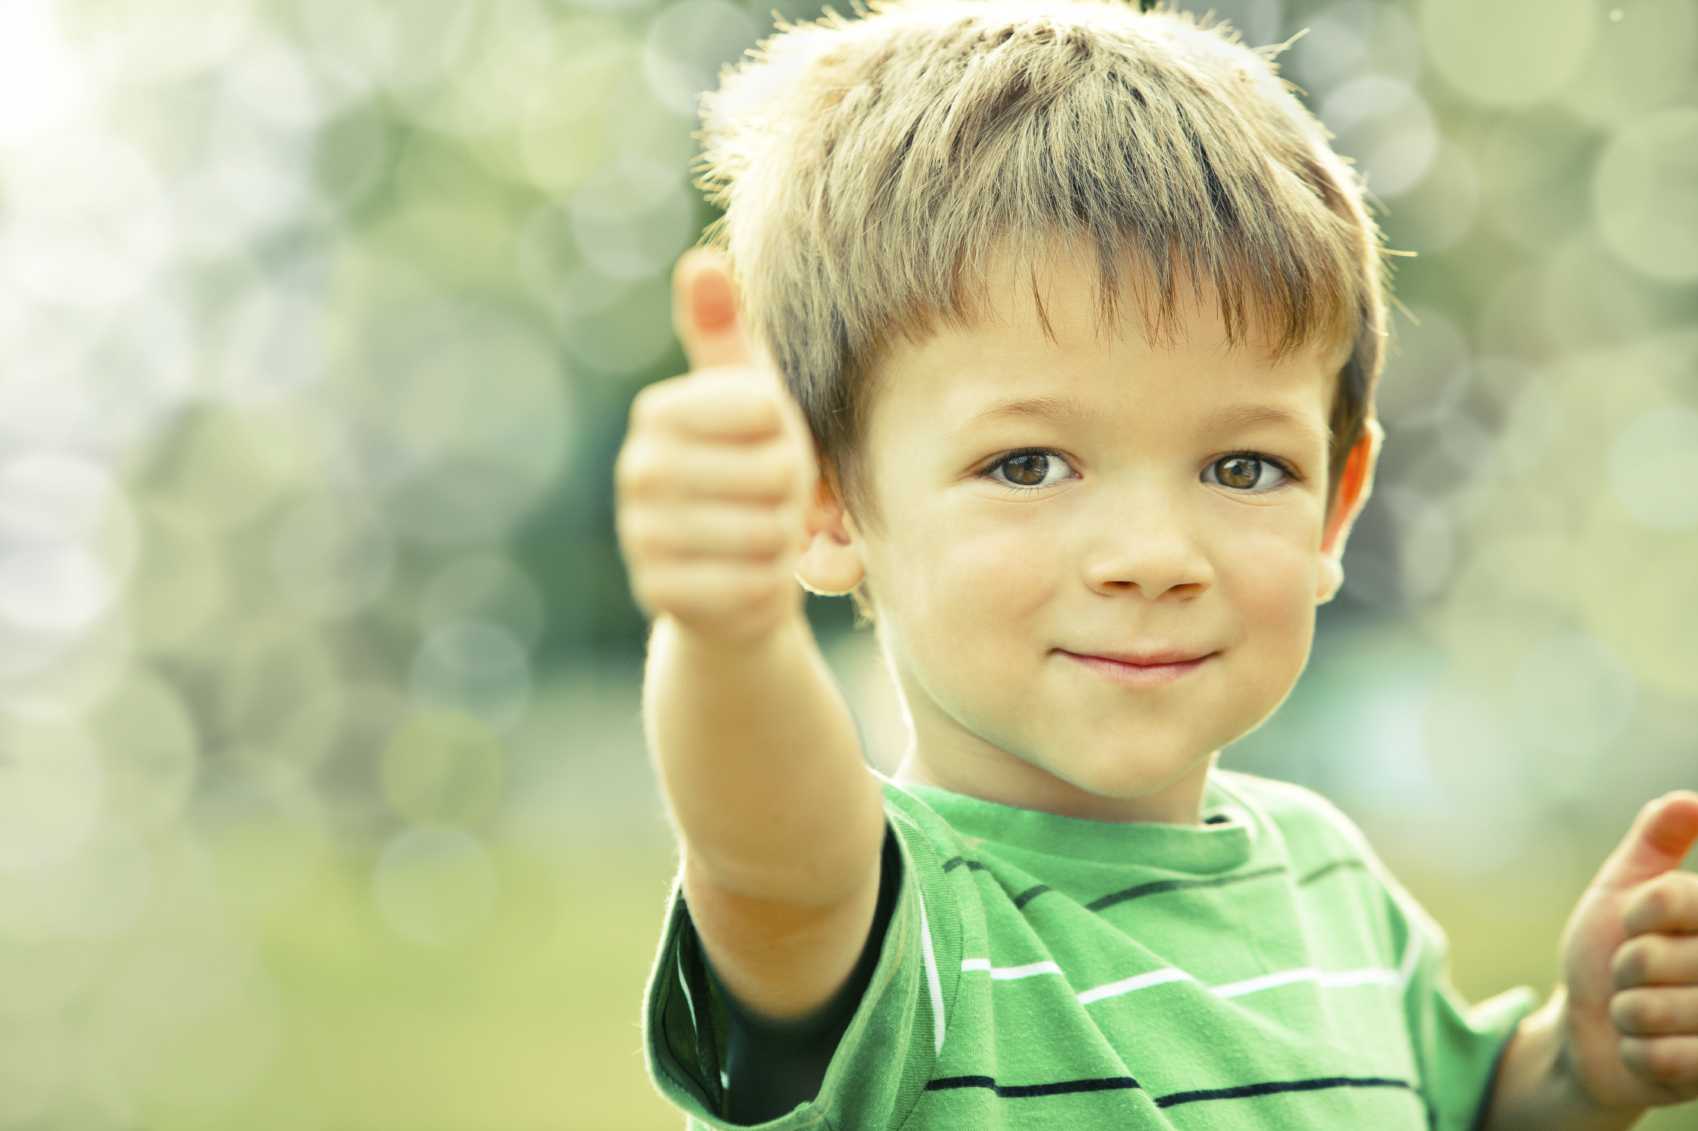 happy smiling kid outdoor doing OK portrait green tone | Dixie ...